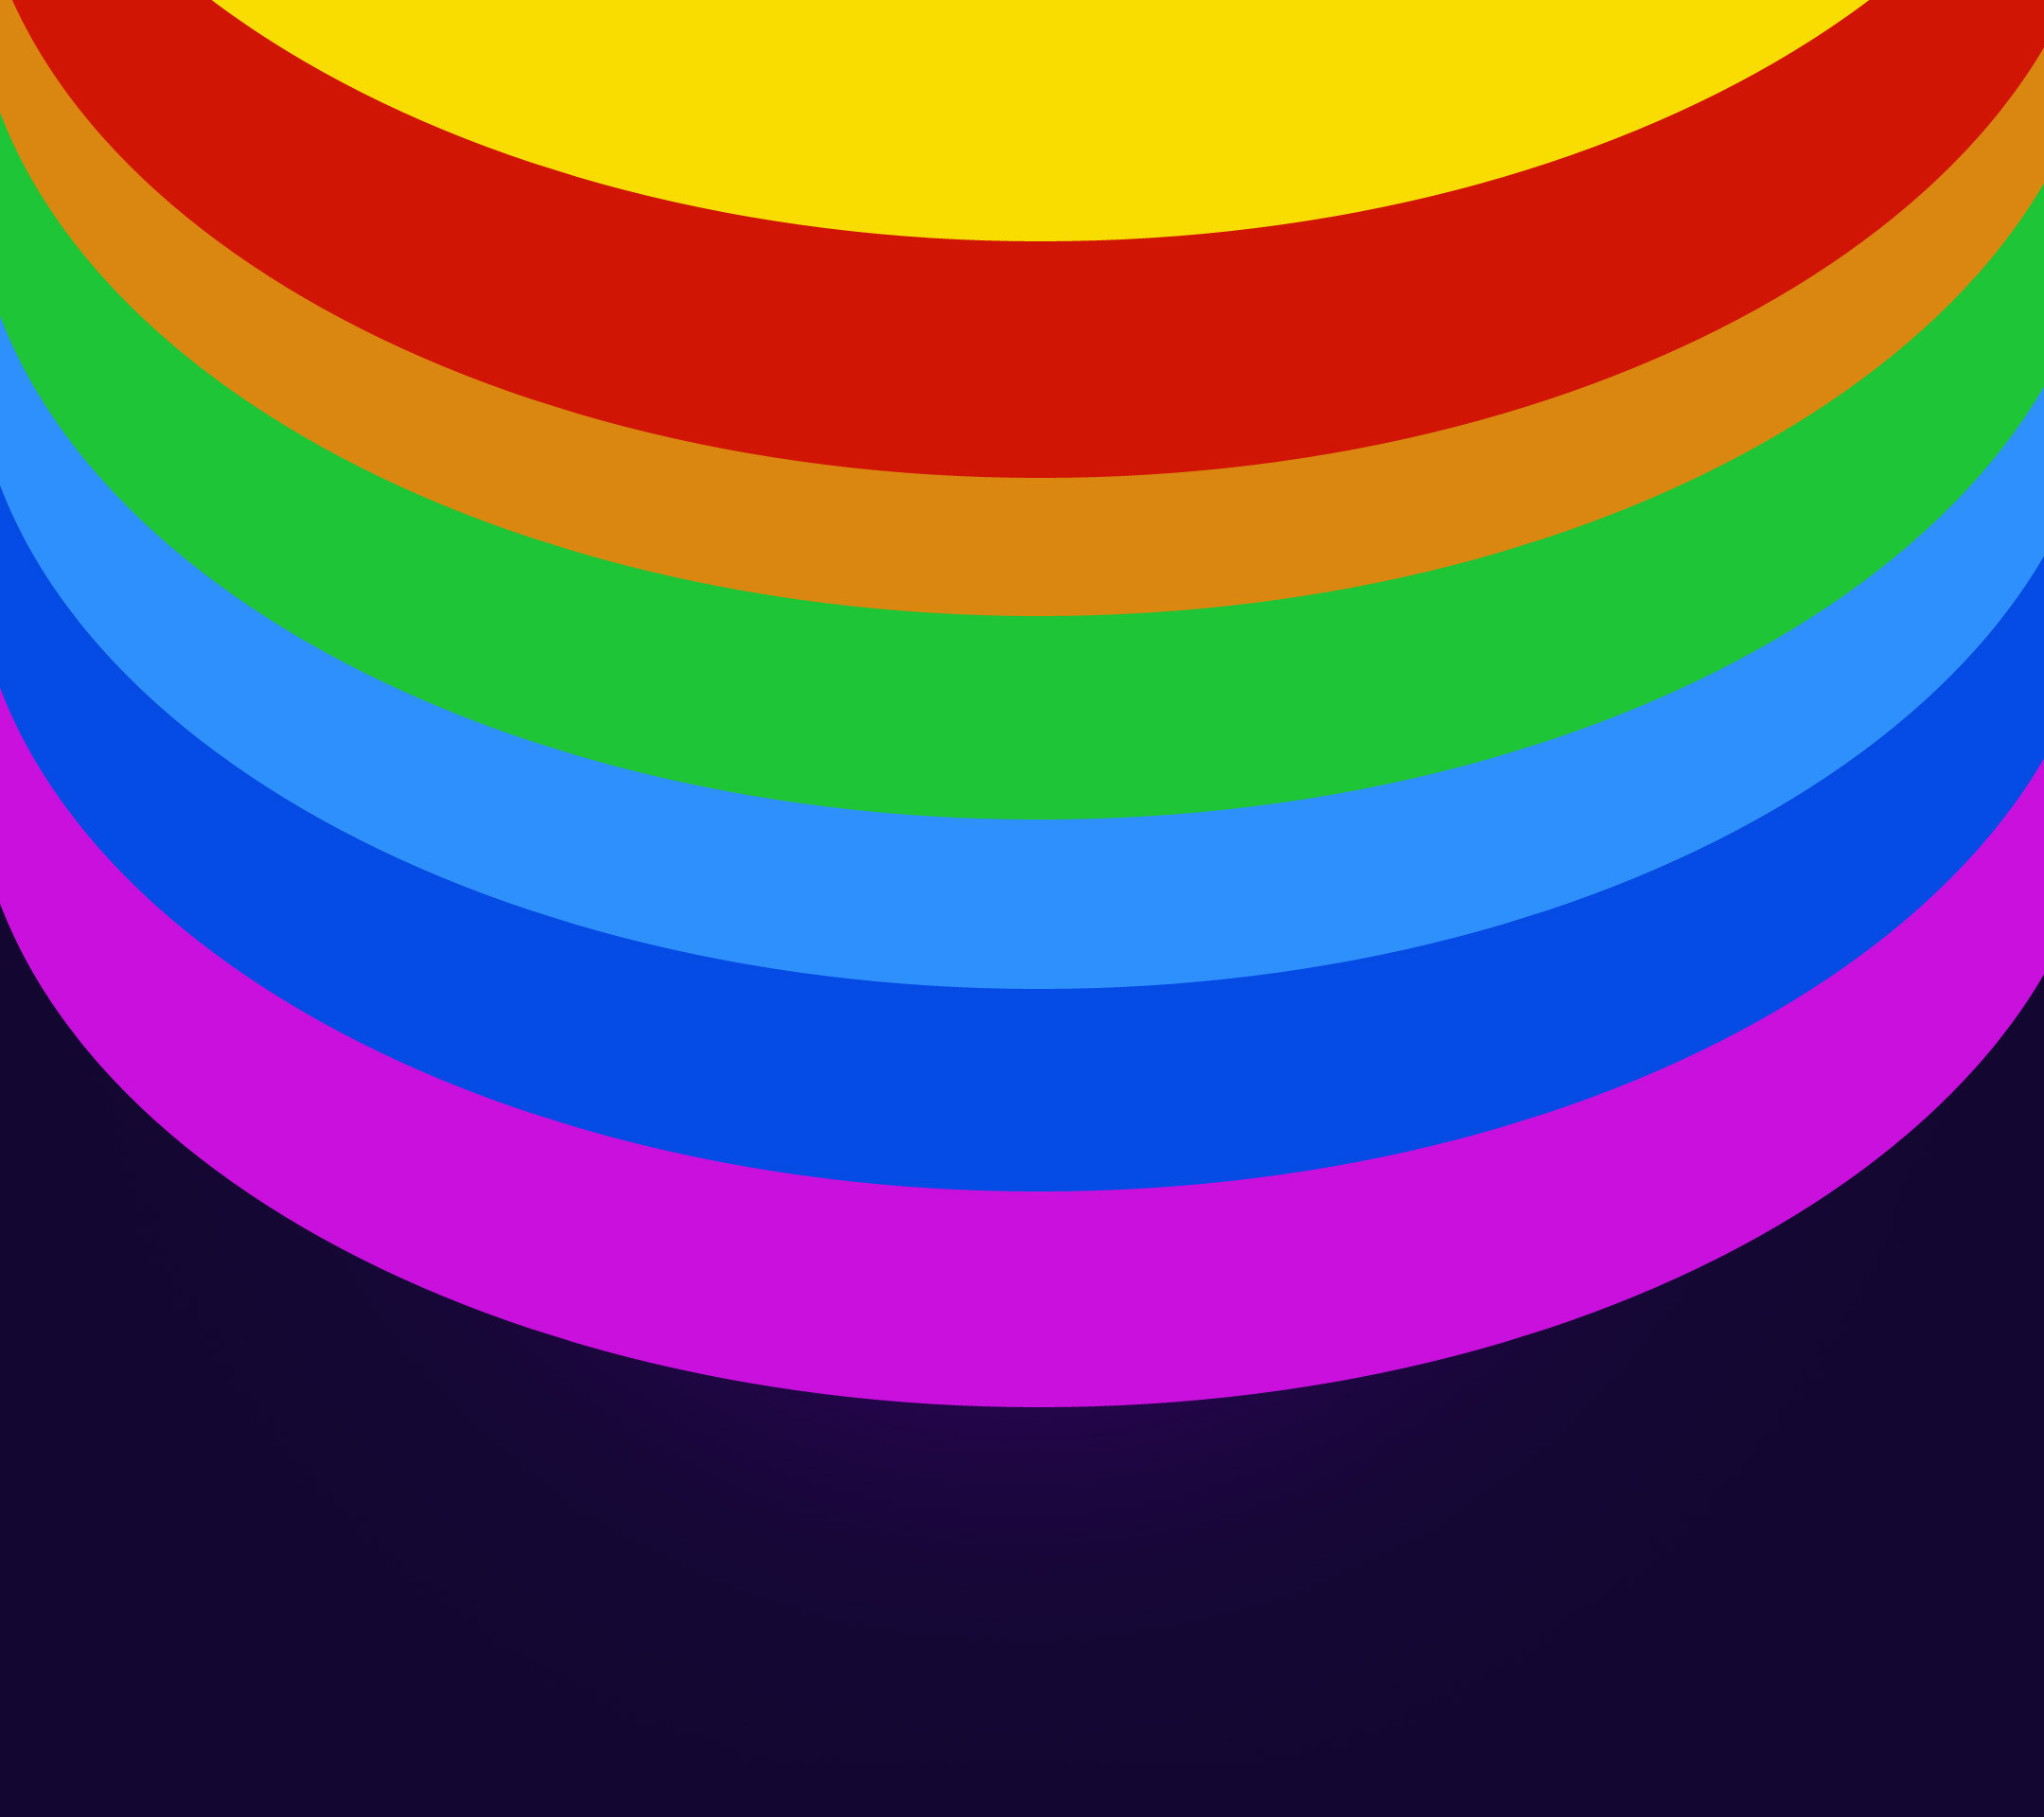 Rainbow colored circles Wallpaper